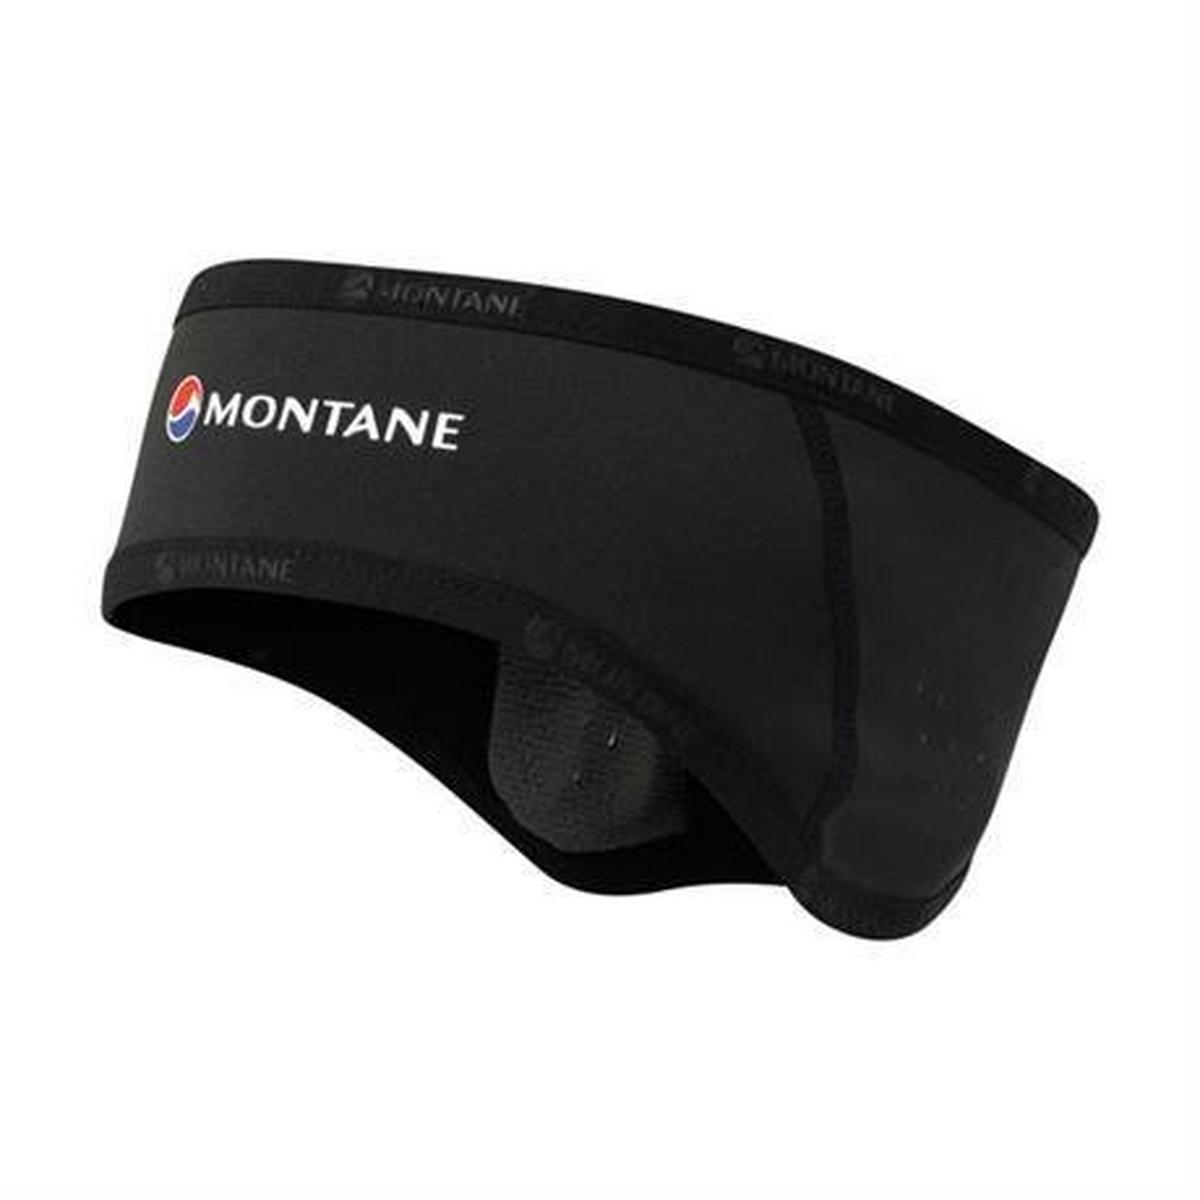 Montane Unisex Montane Windjammer Rock Band - Black